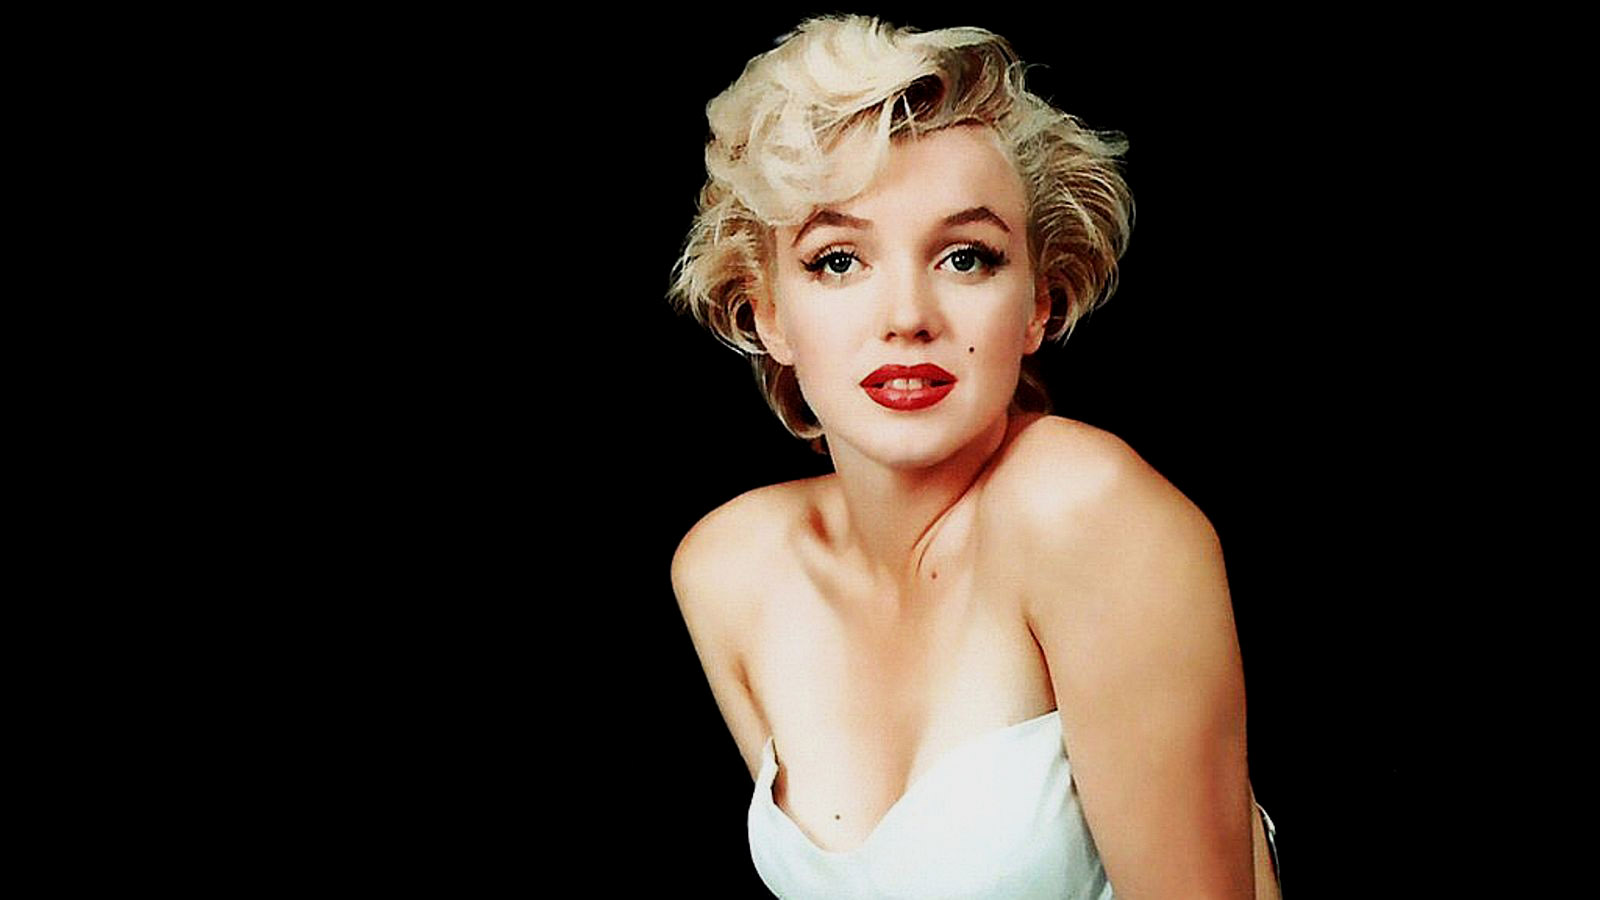 http://2.bp.blogspot.com/-mutKgBSvWTk/UORjO3KgsWI/AAAAAAAACjw/LXqjcQ3-21k/s1600/Marilyn+Monroe.jpg